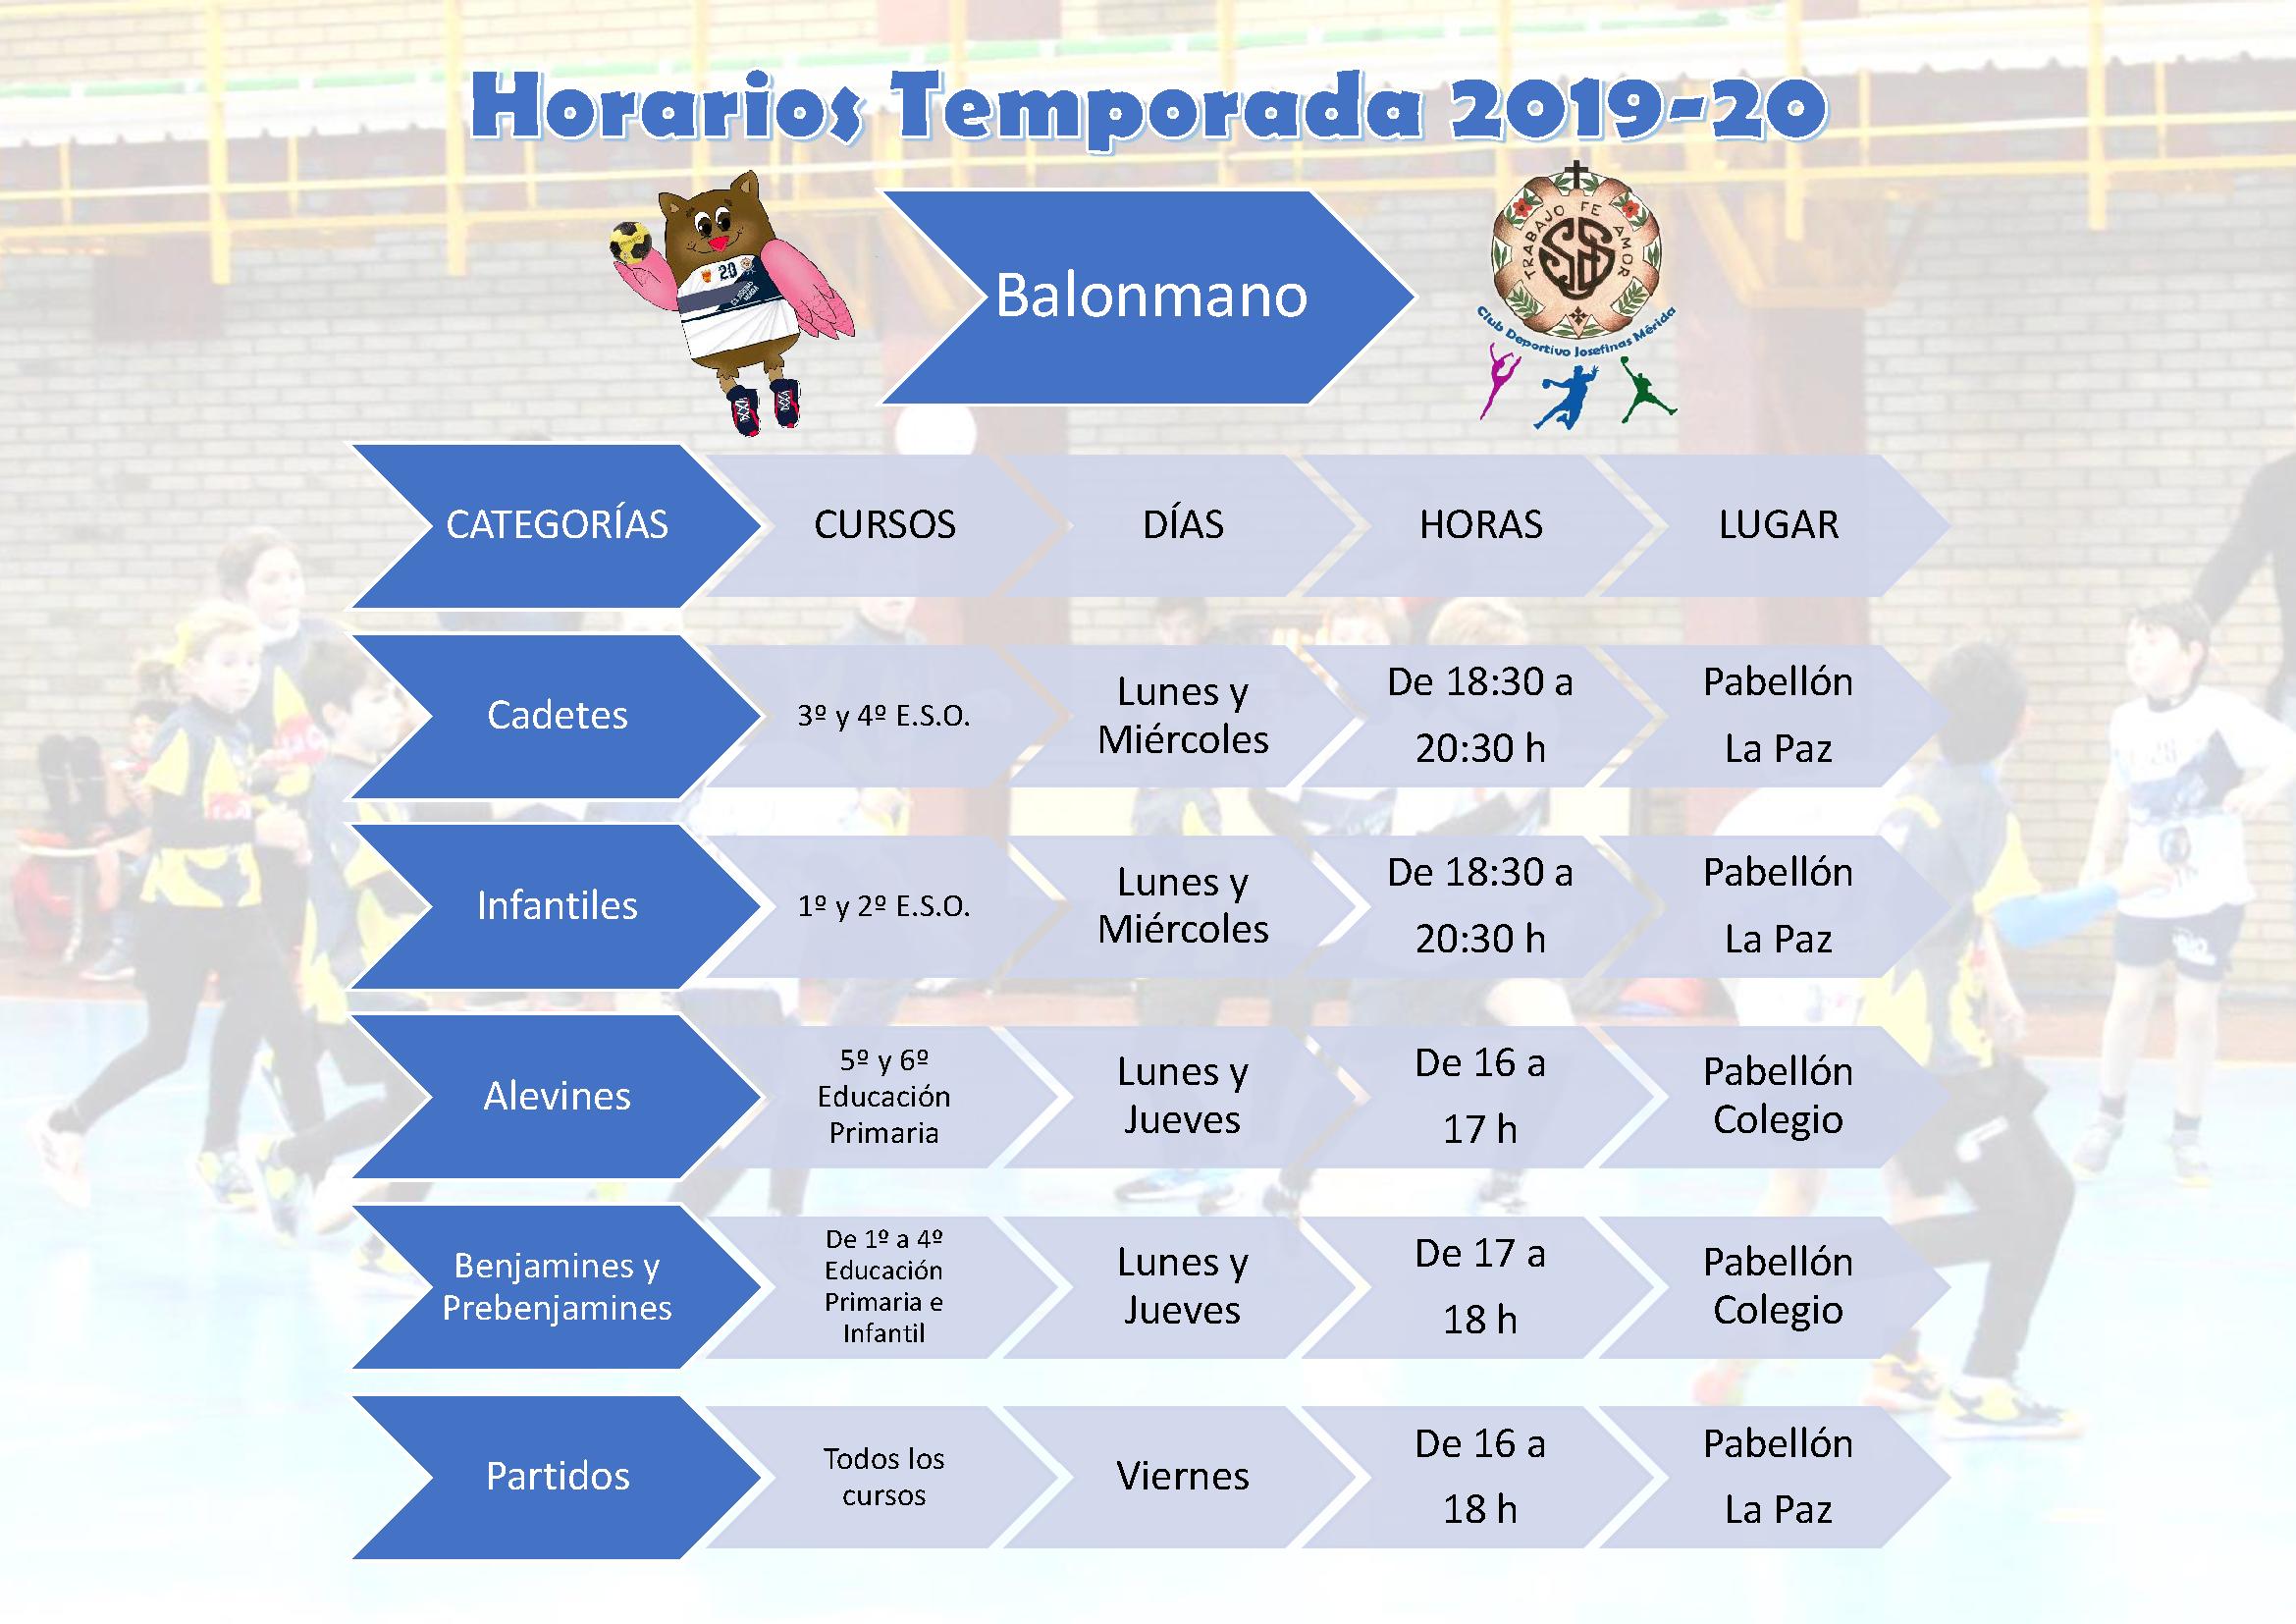 Horarios Balonmano Temporada 19-20png